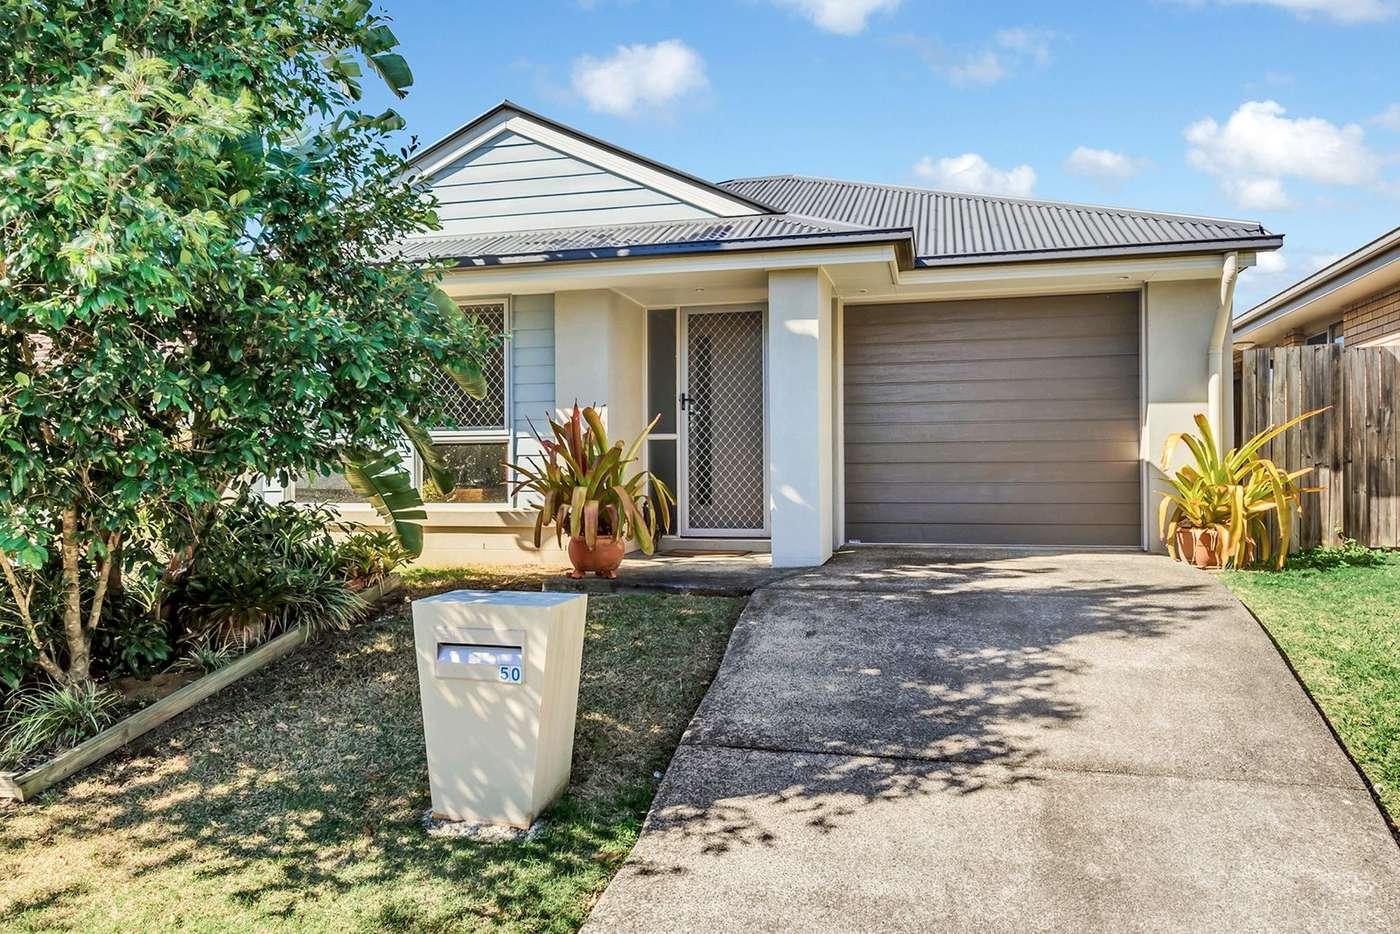 Main view of Homely house listing, 50 Lennon Boulevard, Narangba QLD 4504